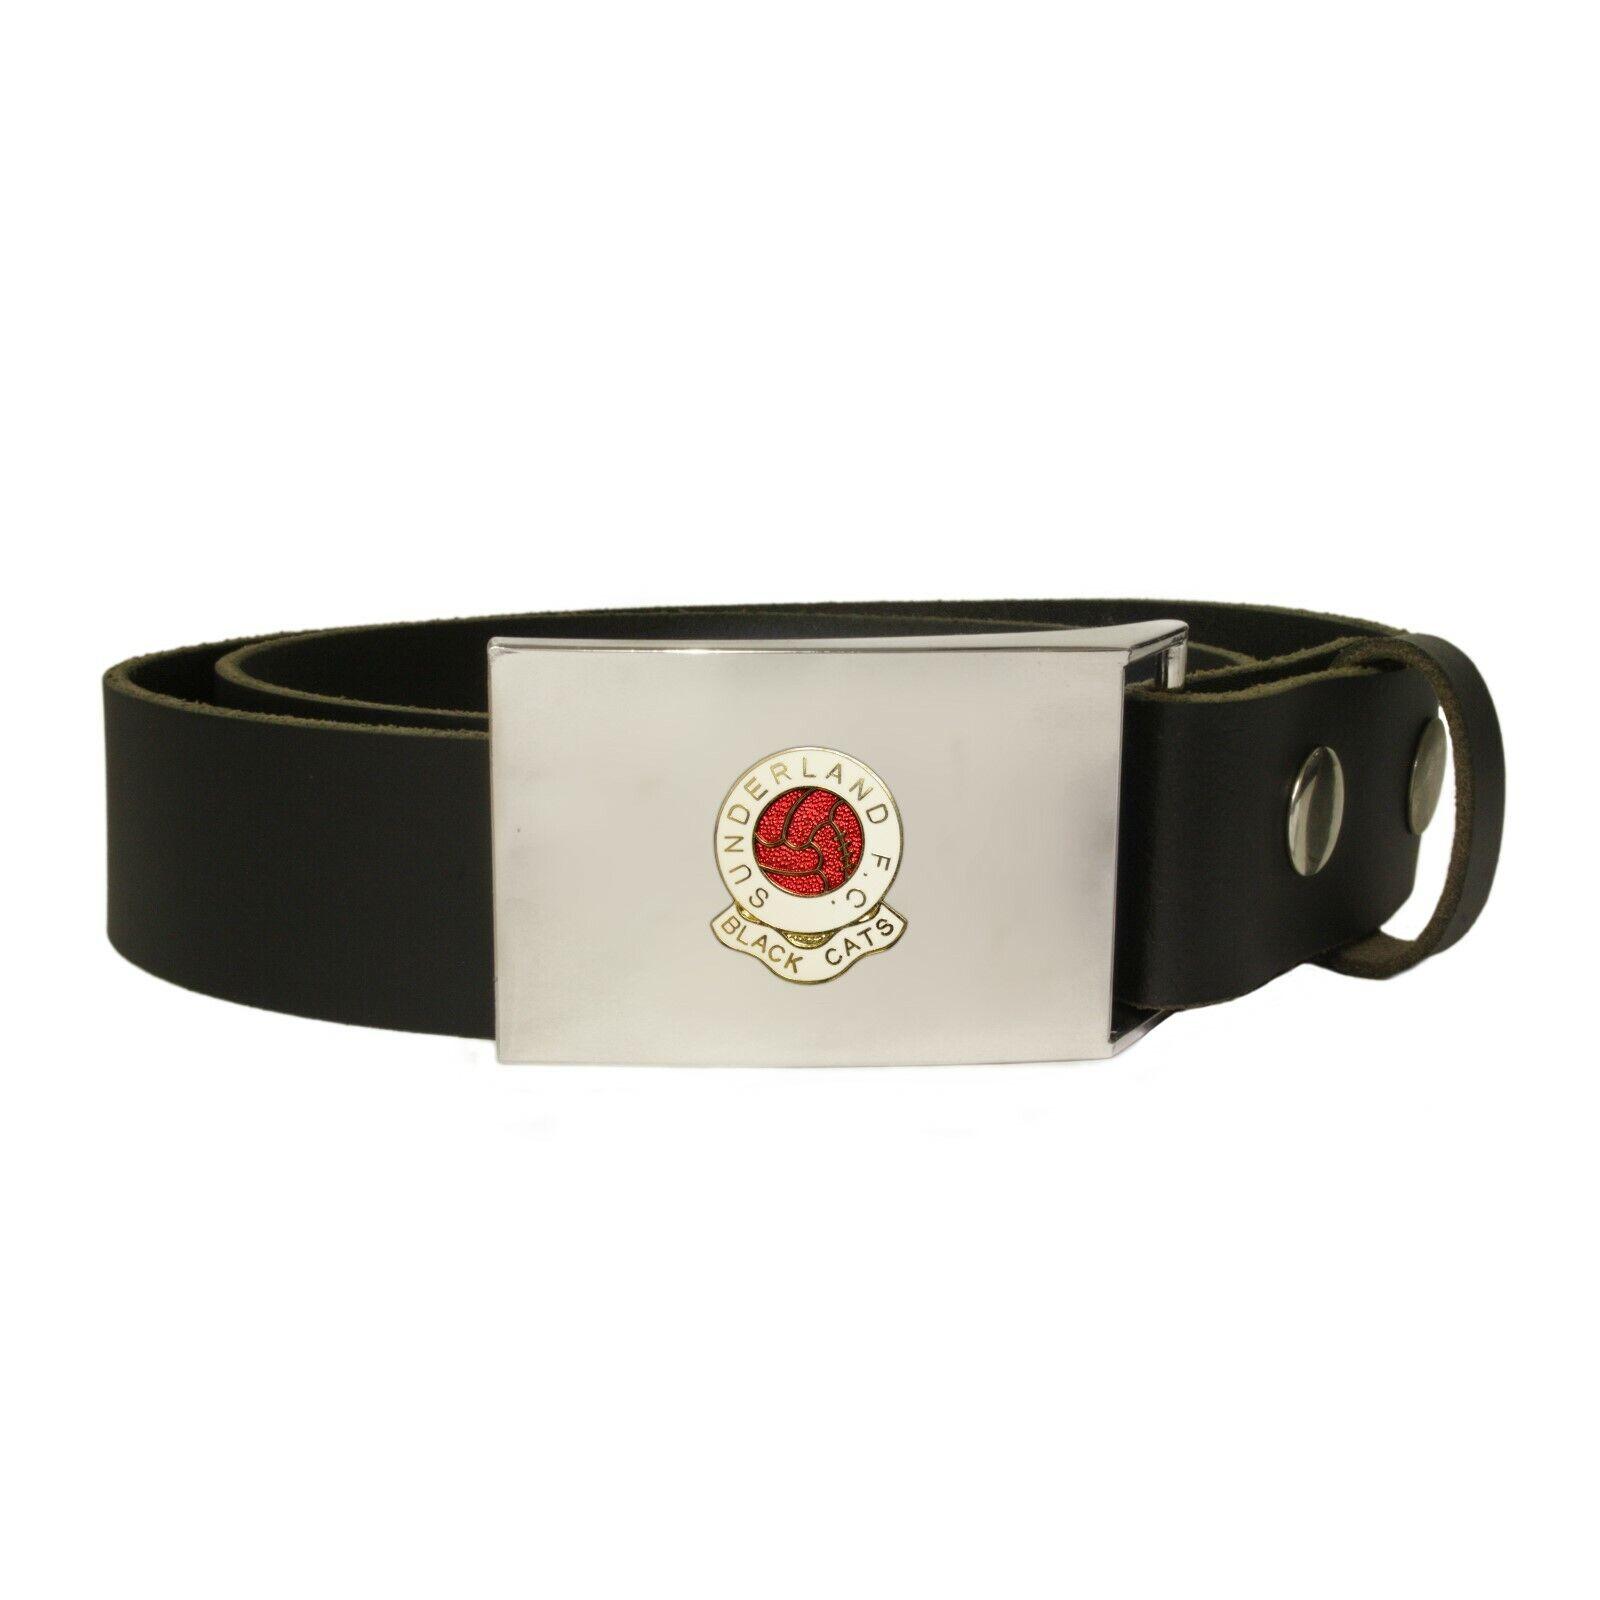 Sunderland football club leather snap fit belt